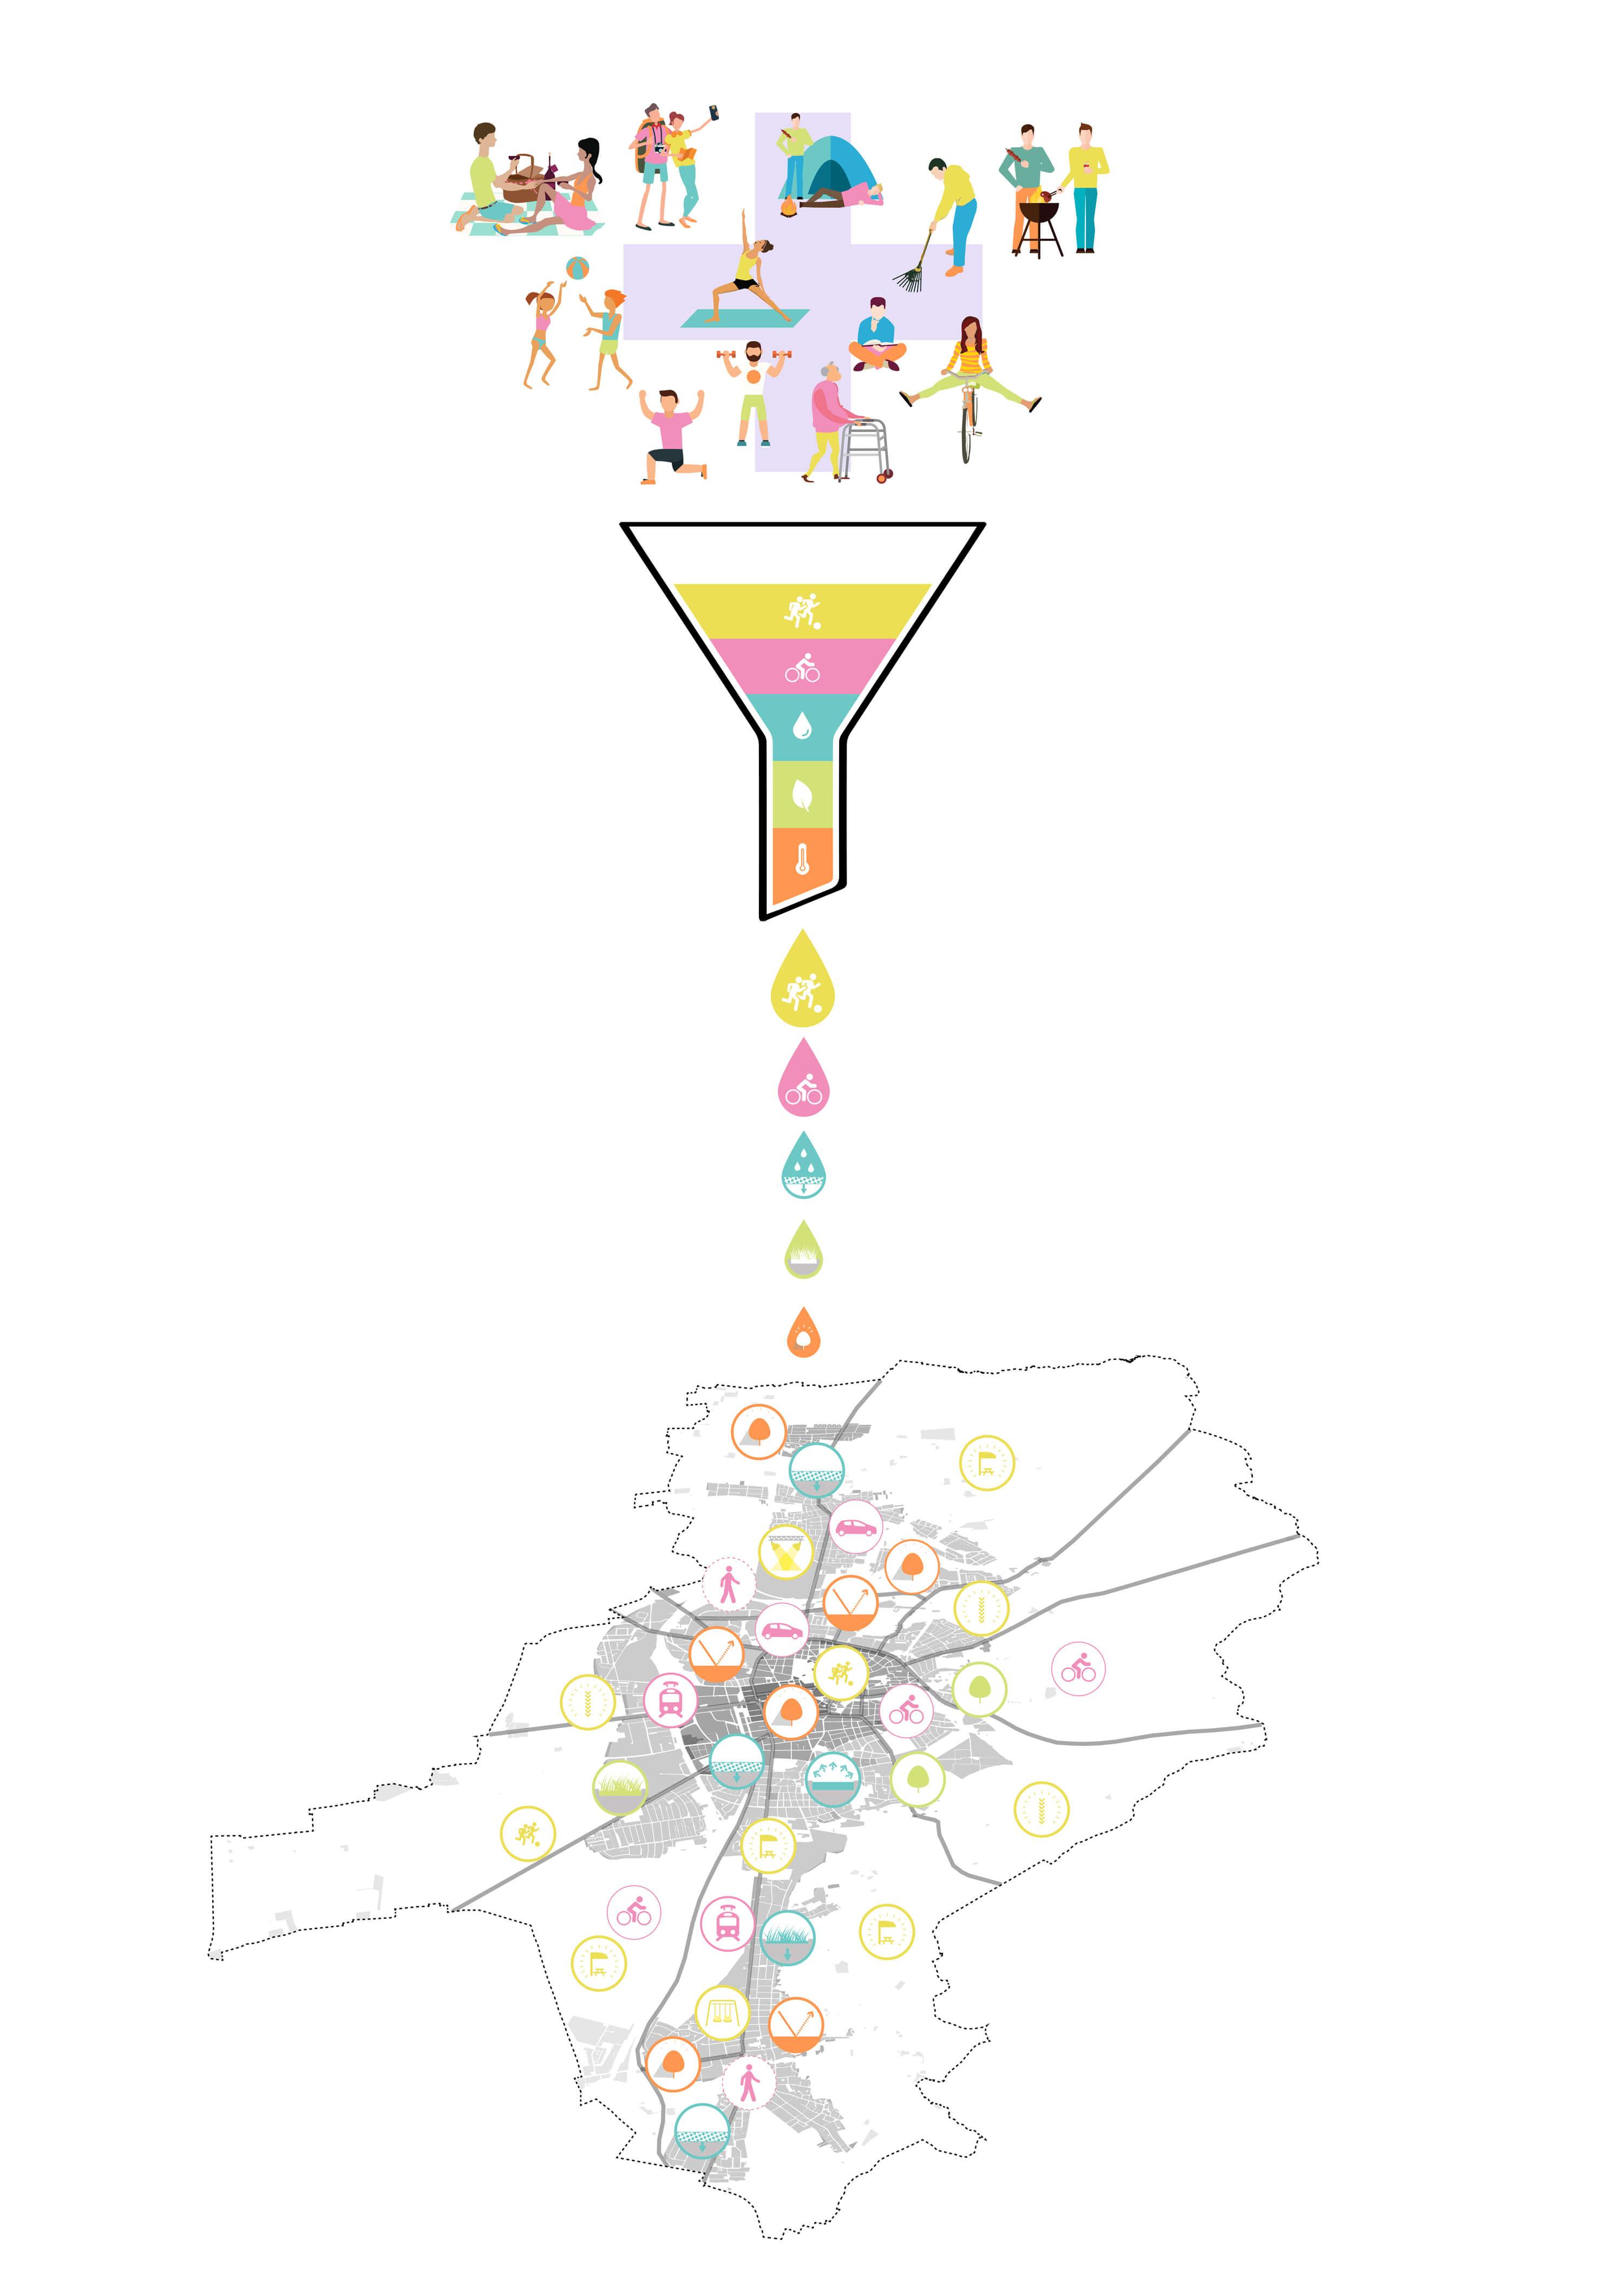 felixx-darmstadt-concept.jpg